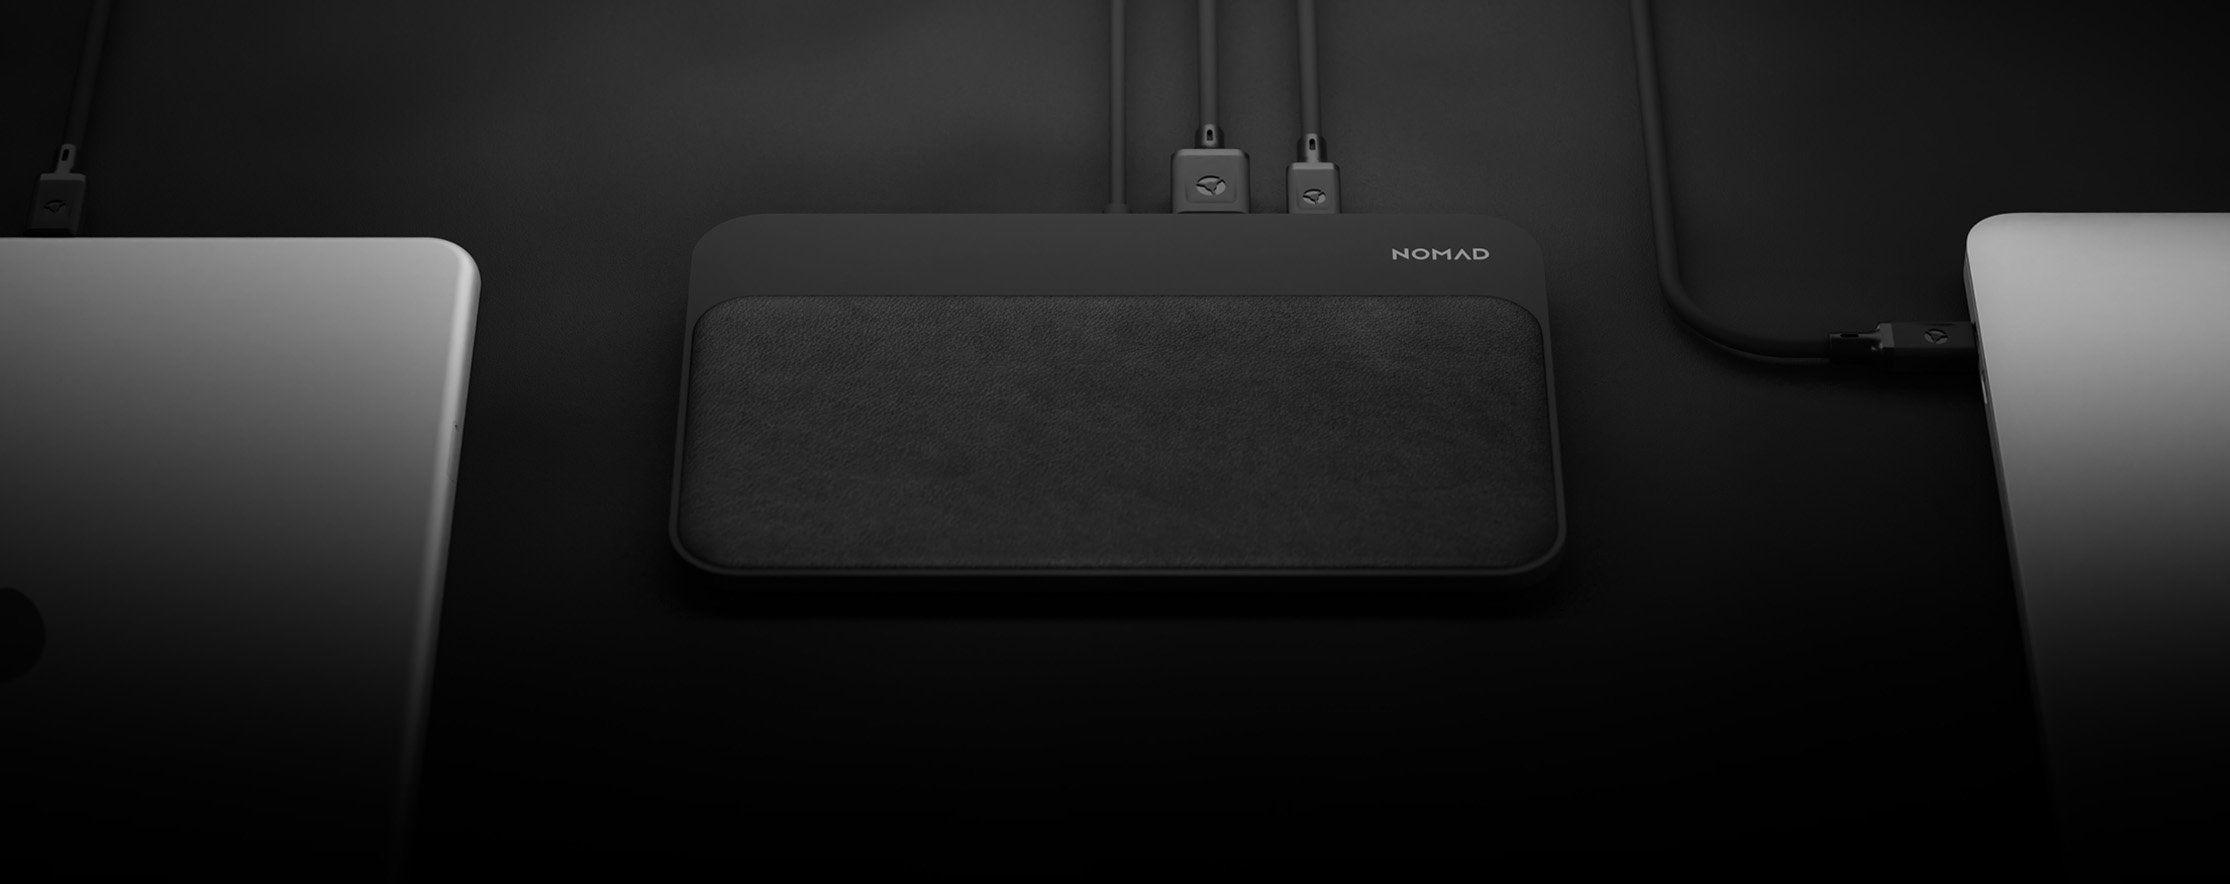 Https Hellonomad Com Products Base Station Hub Apple Watch Charging Apple Watch Charging Stand Charging Hub